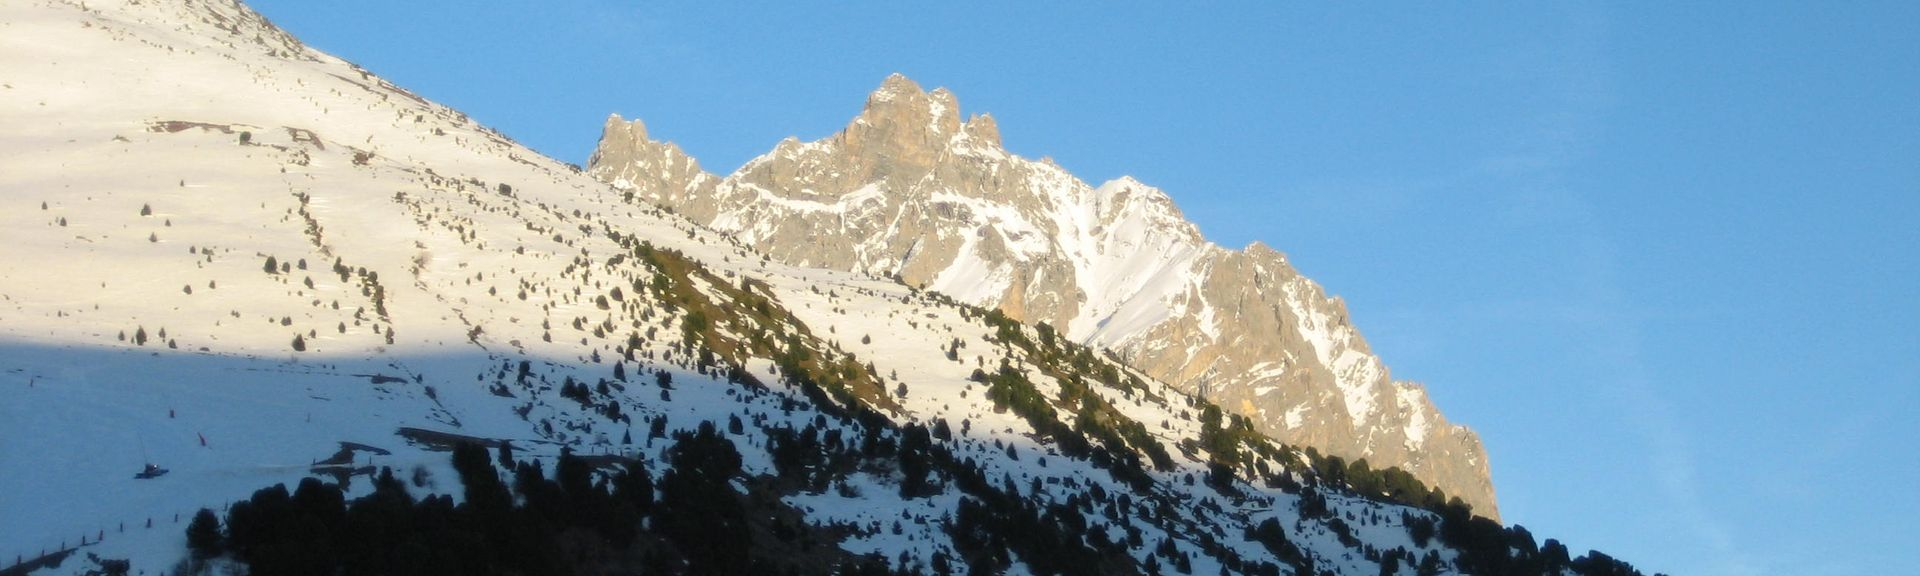 Villarodin-Bourget, Auvergne-Rhône-Alpes, France